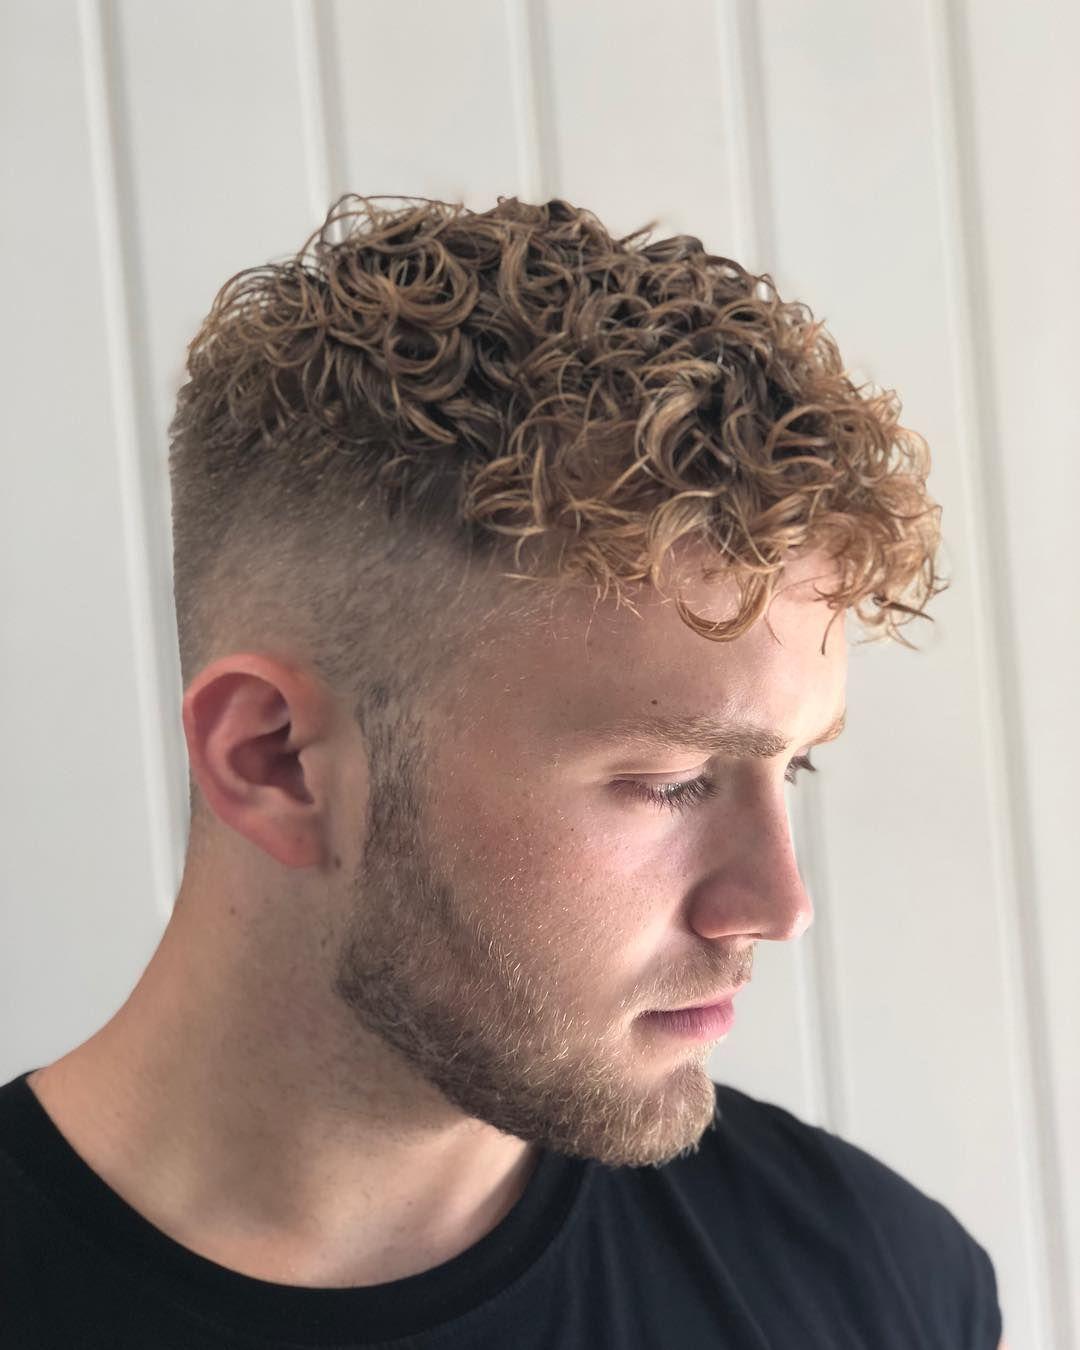 Refreshing Oscar Mcmillan Perm Perm Curls Manperm Merm Short Permed Hair Permed Hairstyles Perm Curls